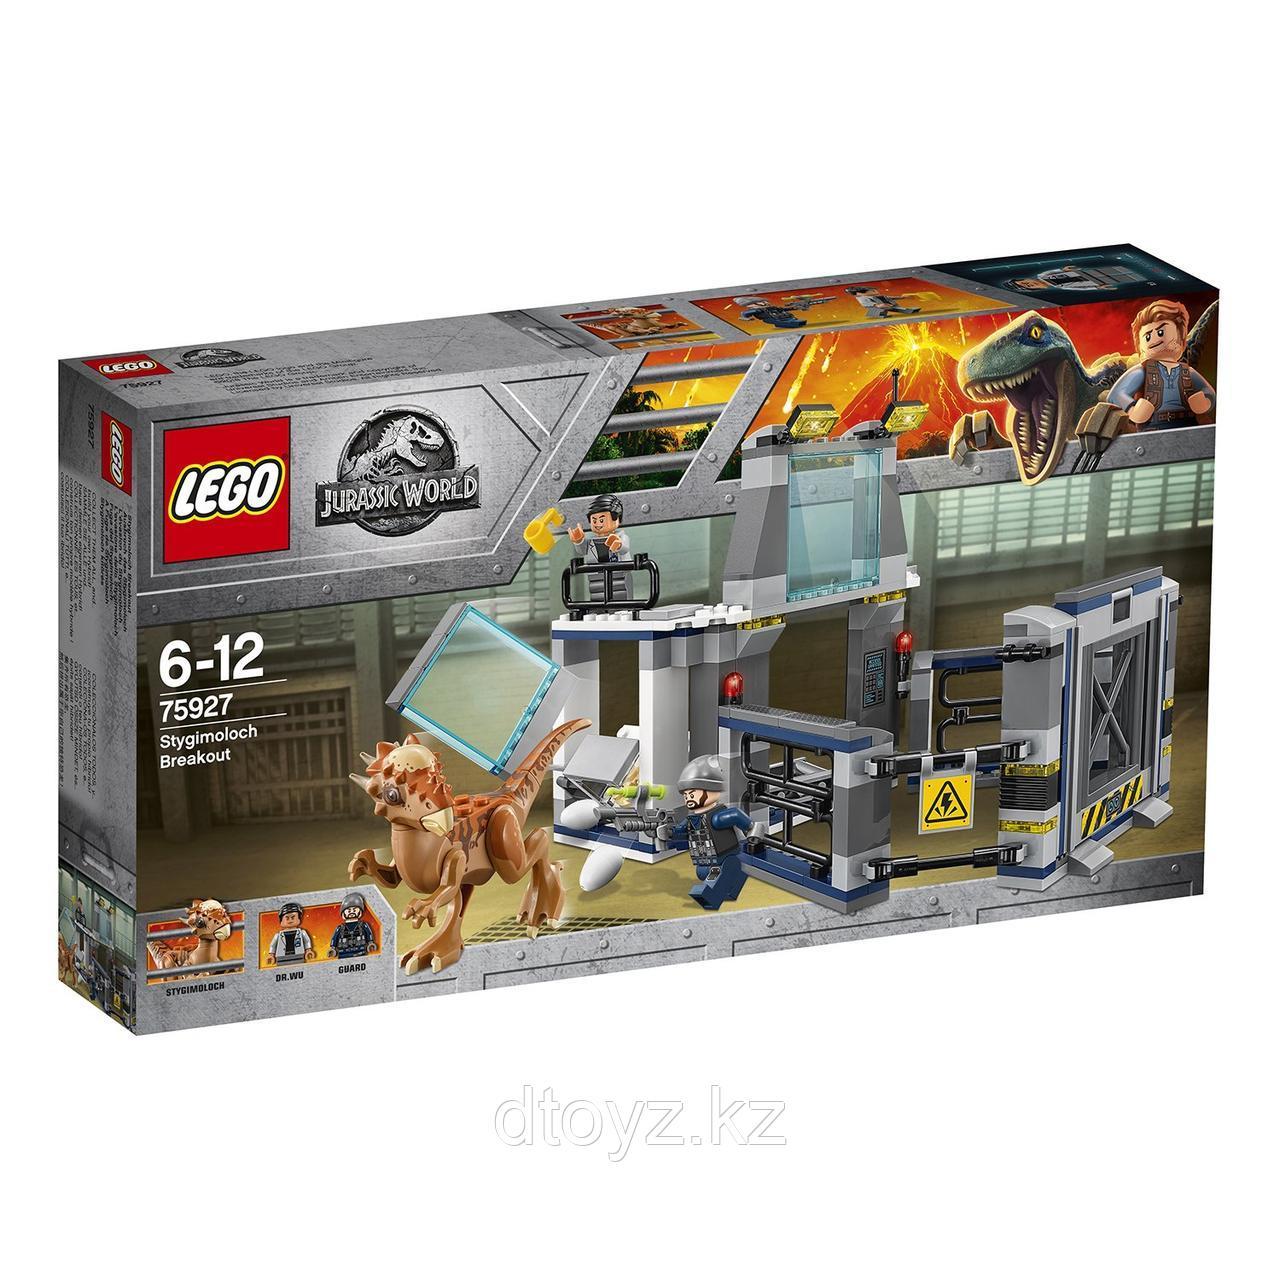 Lego Jurassic World 75927 Побег стигимолоха из лаборатории